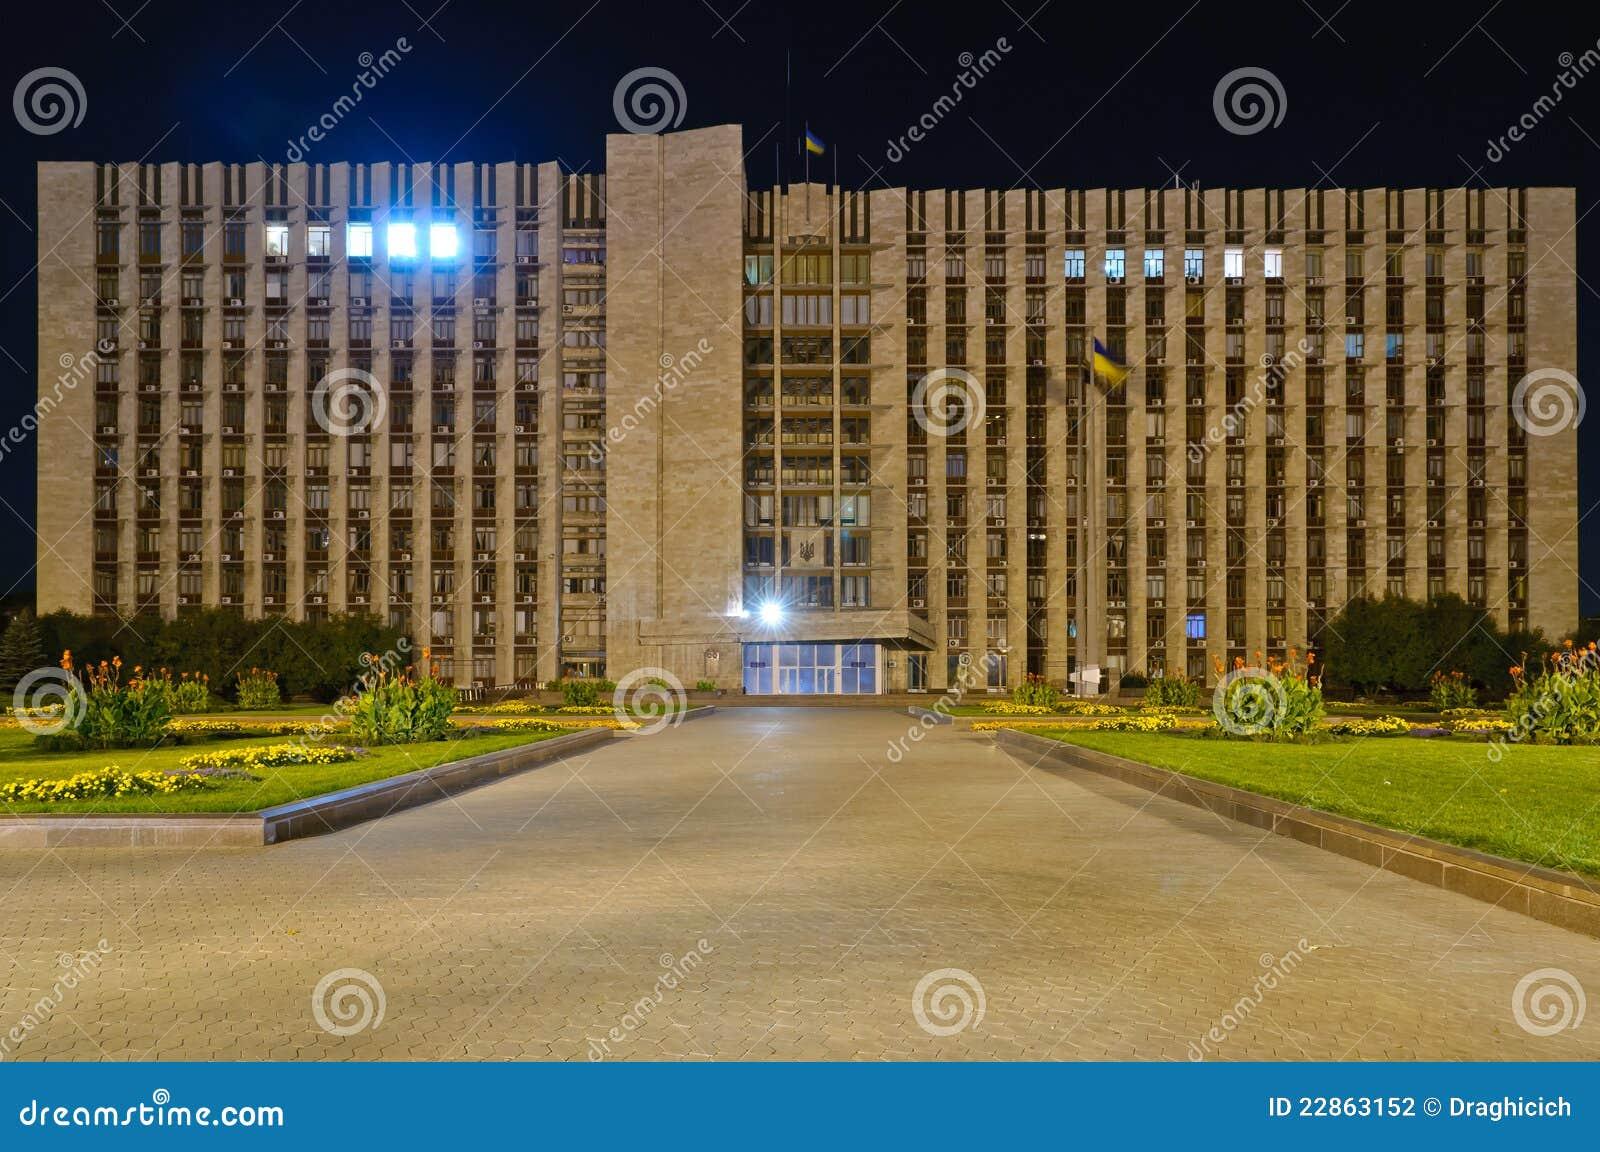 Donetsk, Ukraine, at night